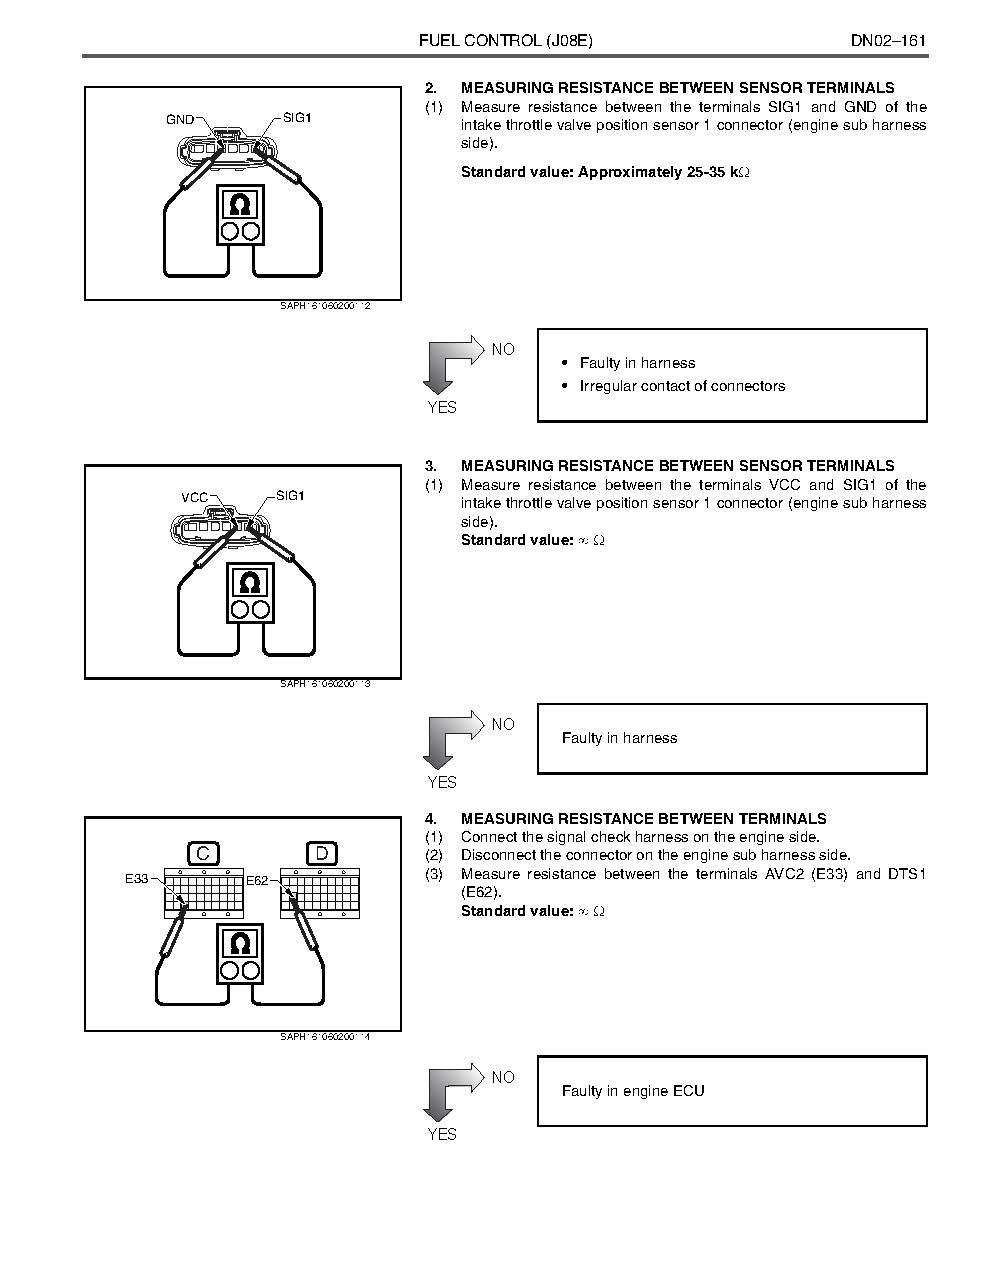 Mack Dm Wiring Diagram Real 2004 Cx613 Diagrams Hino 258 Can U Haul Trailer Harness Truck Battery